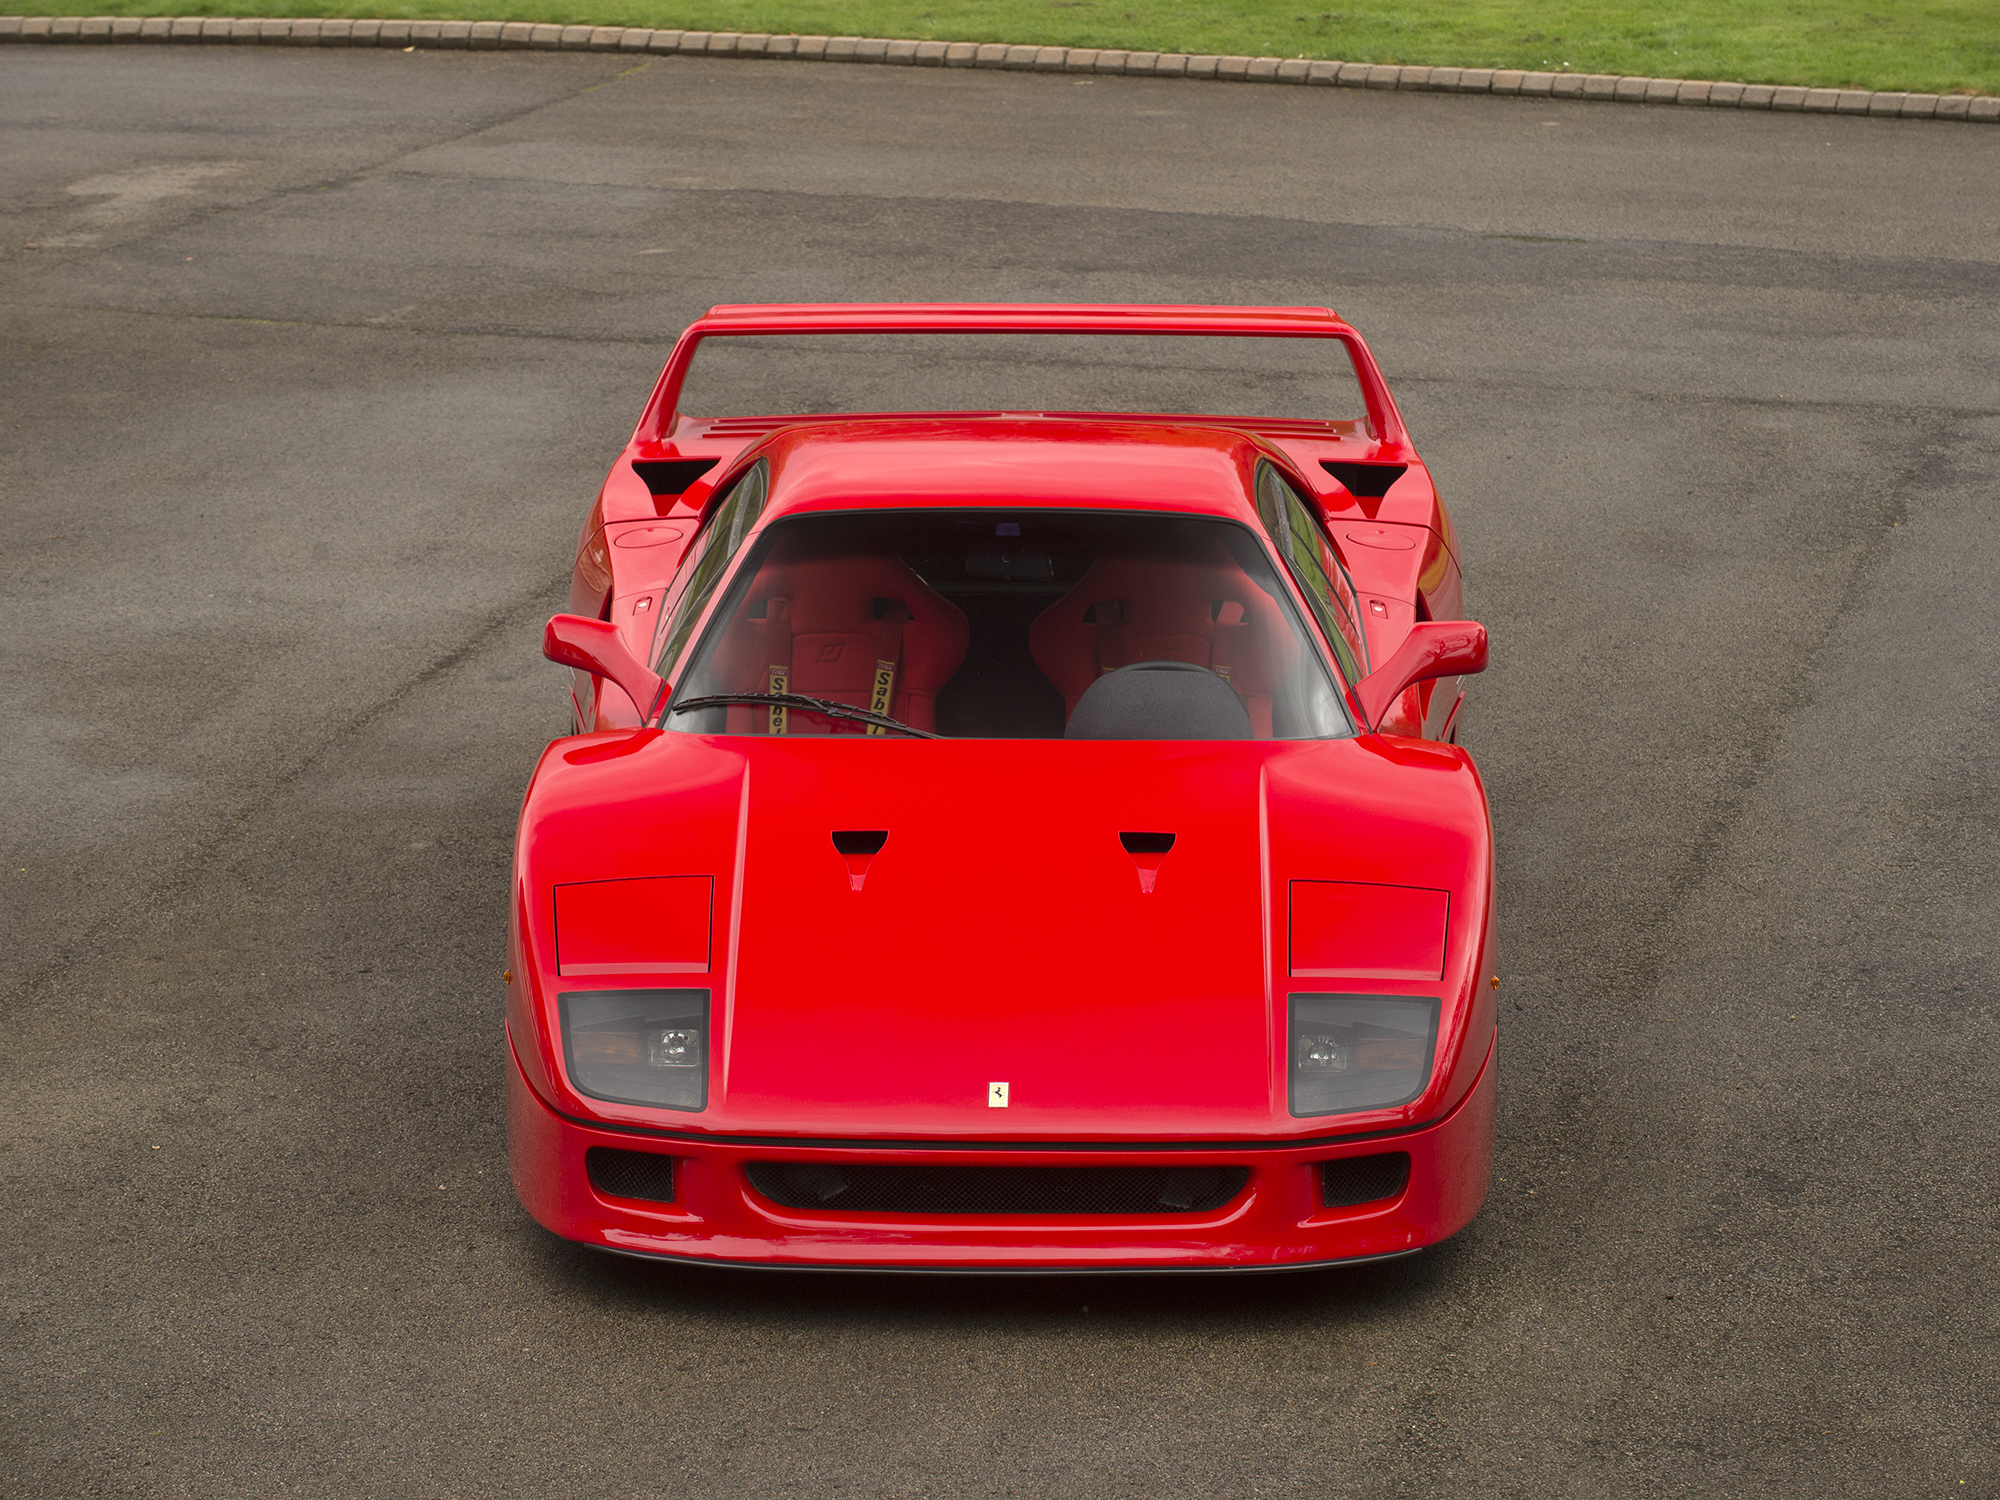 1987 Ferrari F40 Prototype